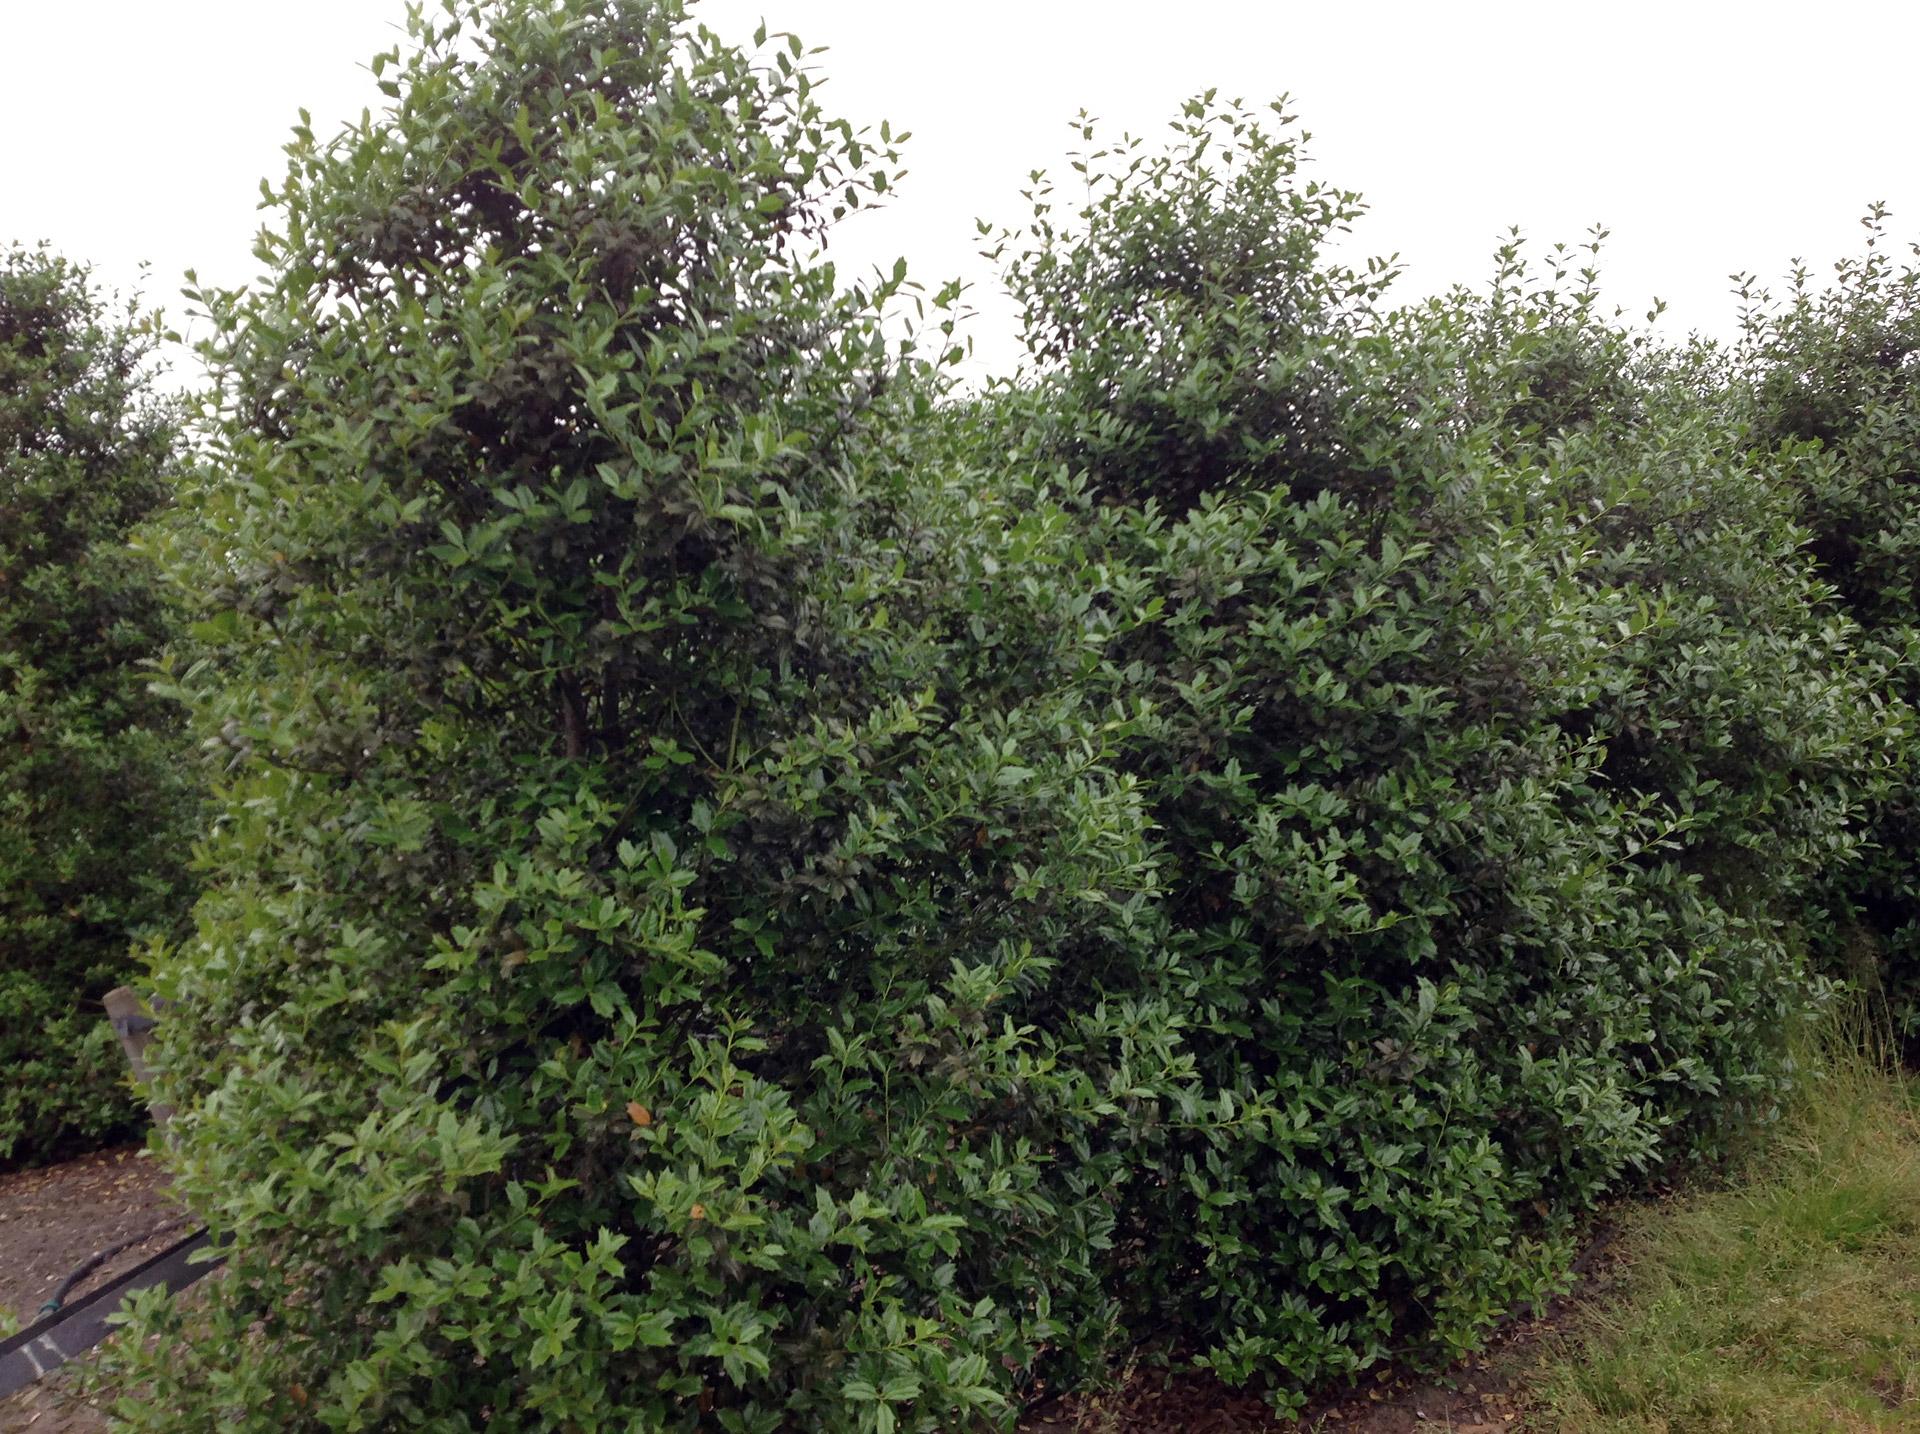 siegbert-van-reeth-boomkwekerij_plantas_0013